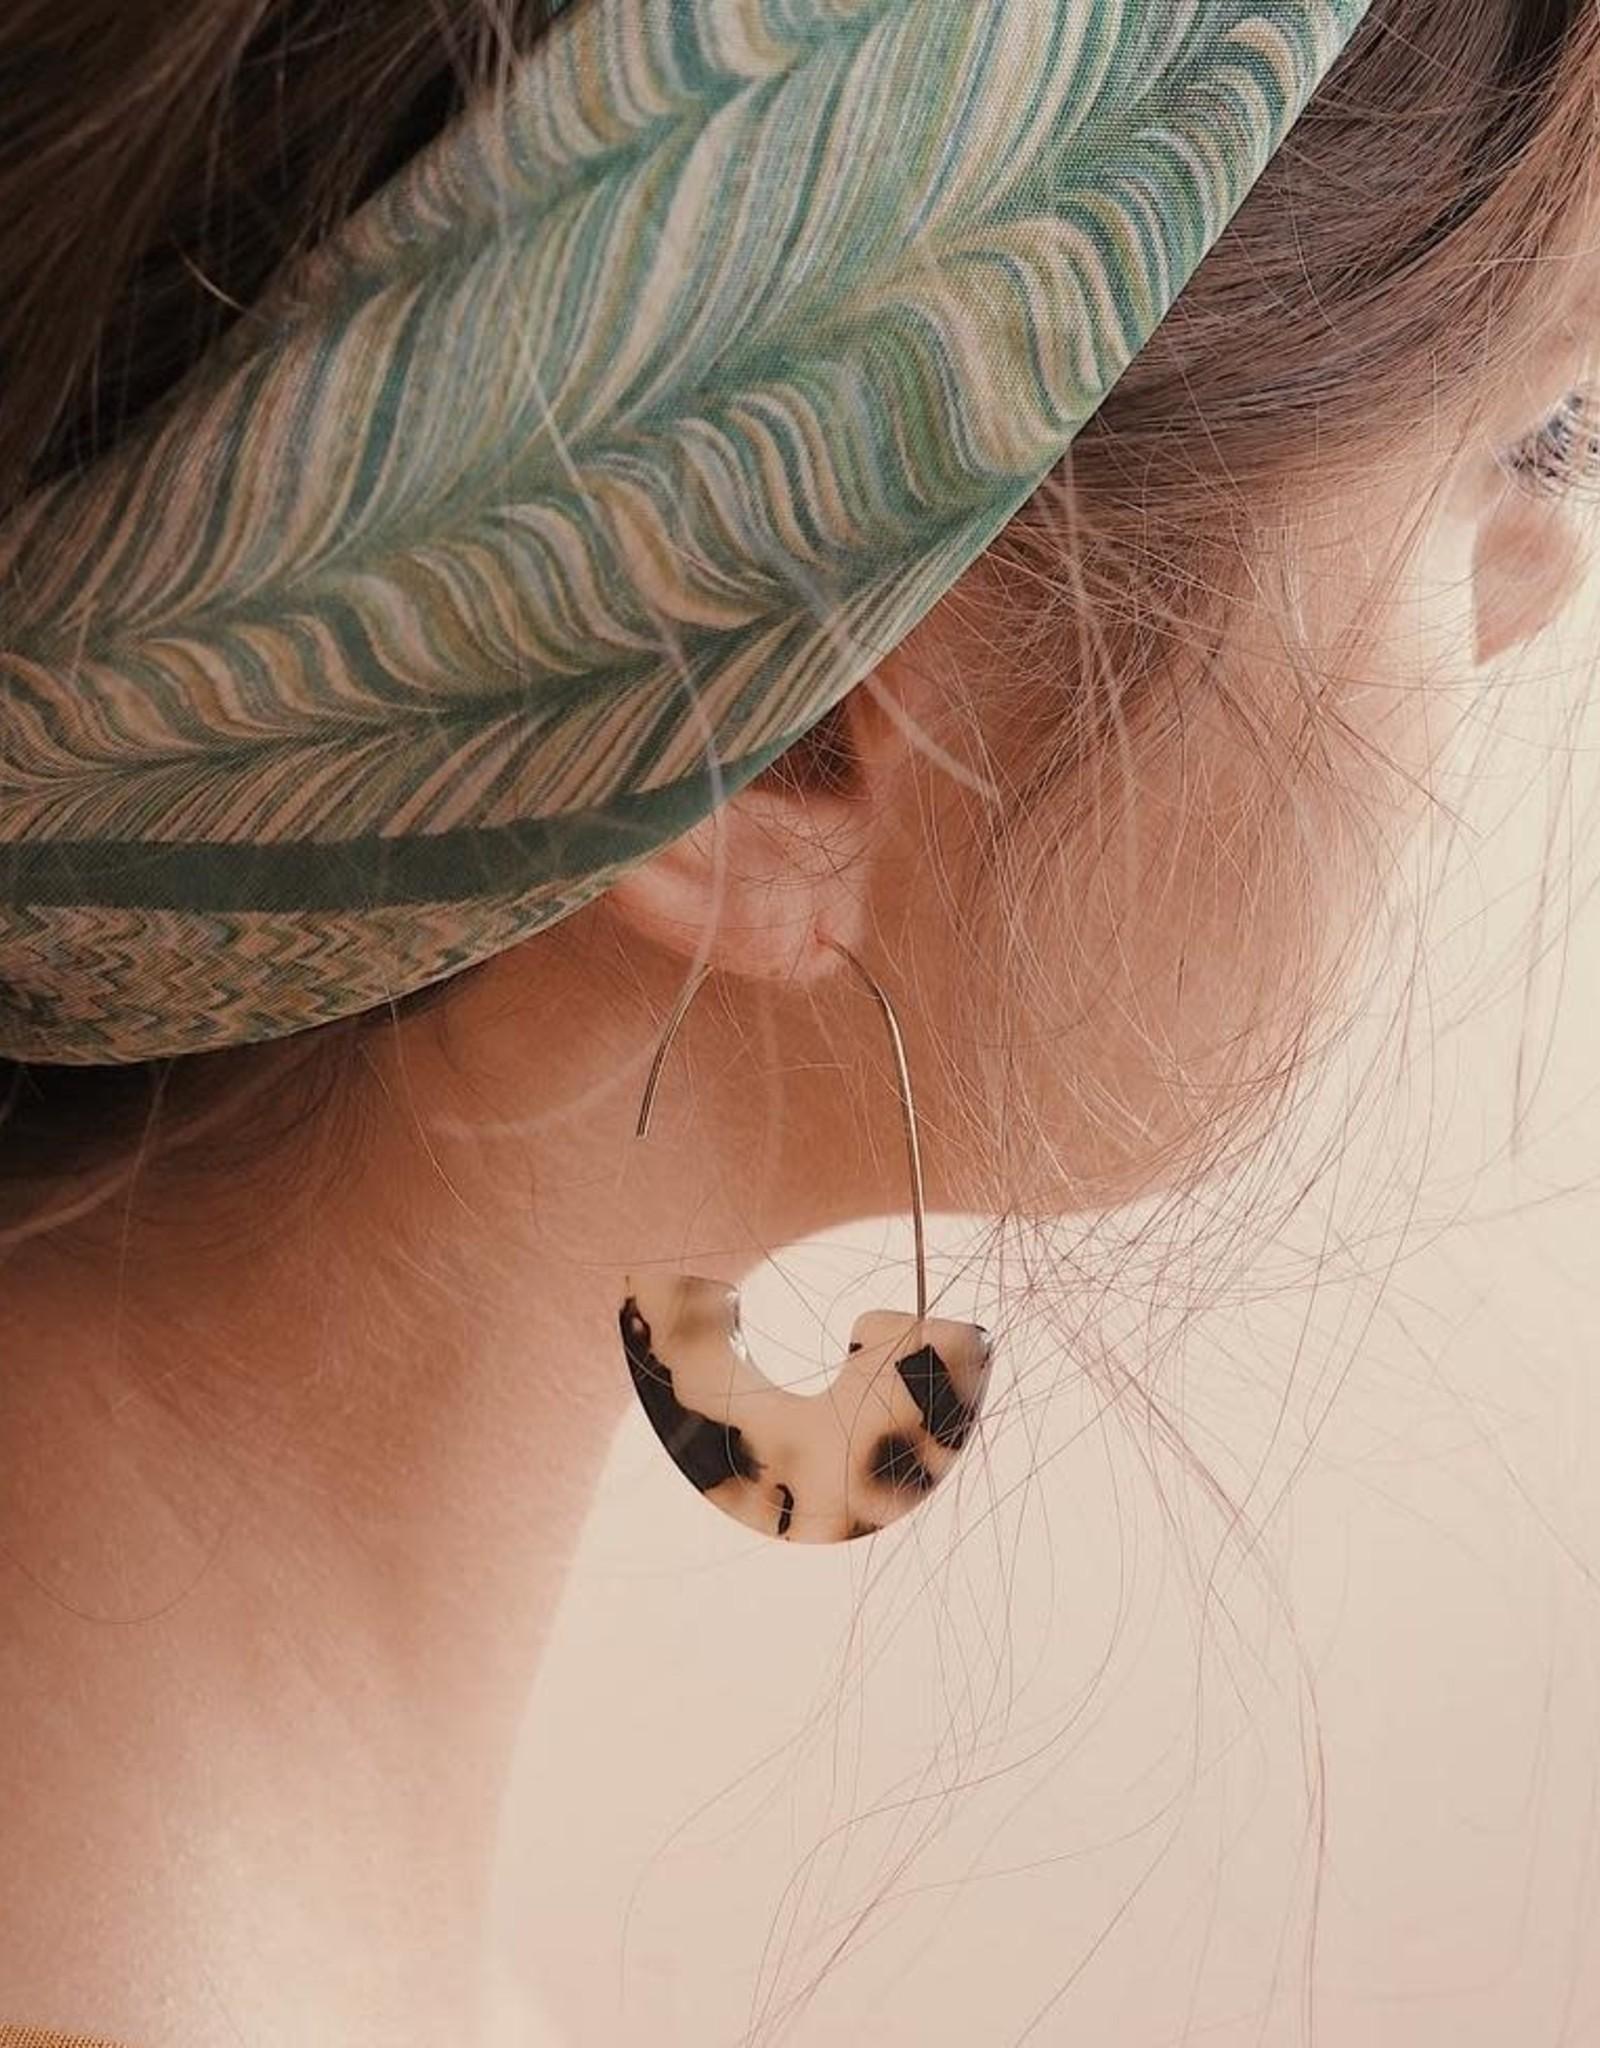 Vayu Jewels Zeta Earrings - Sunset